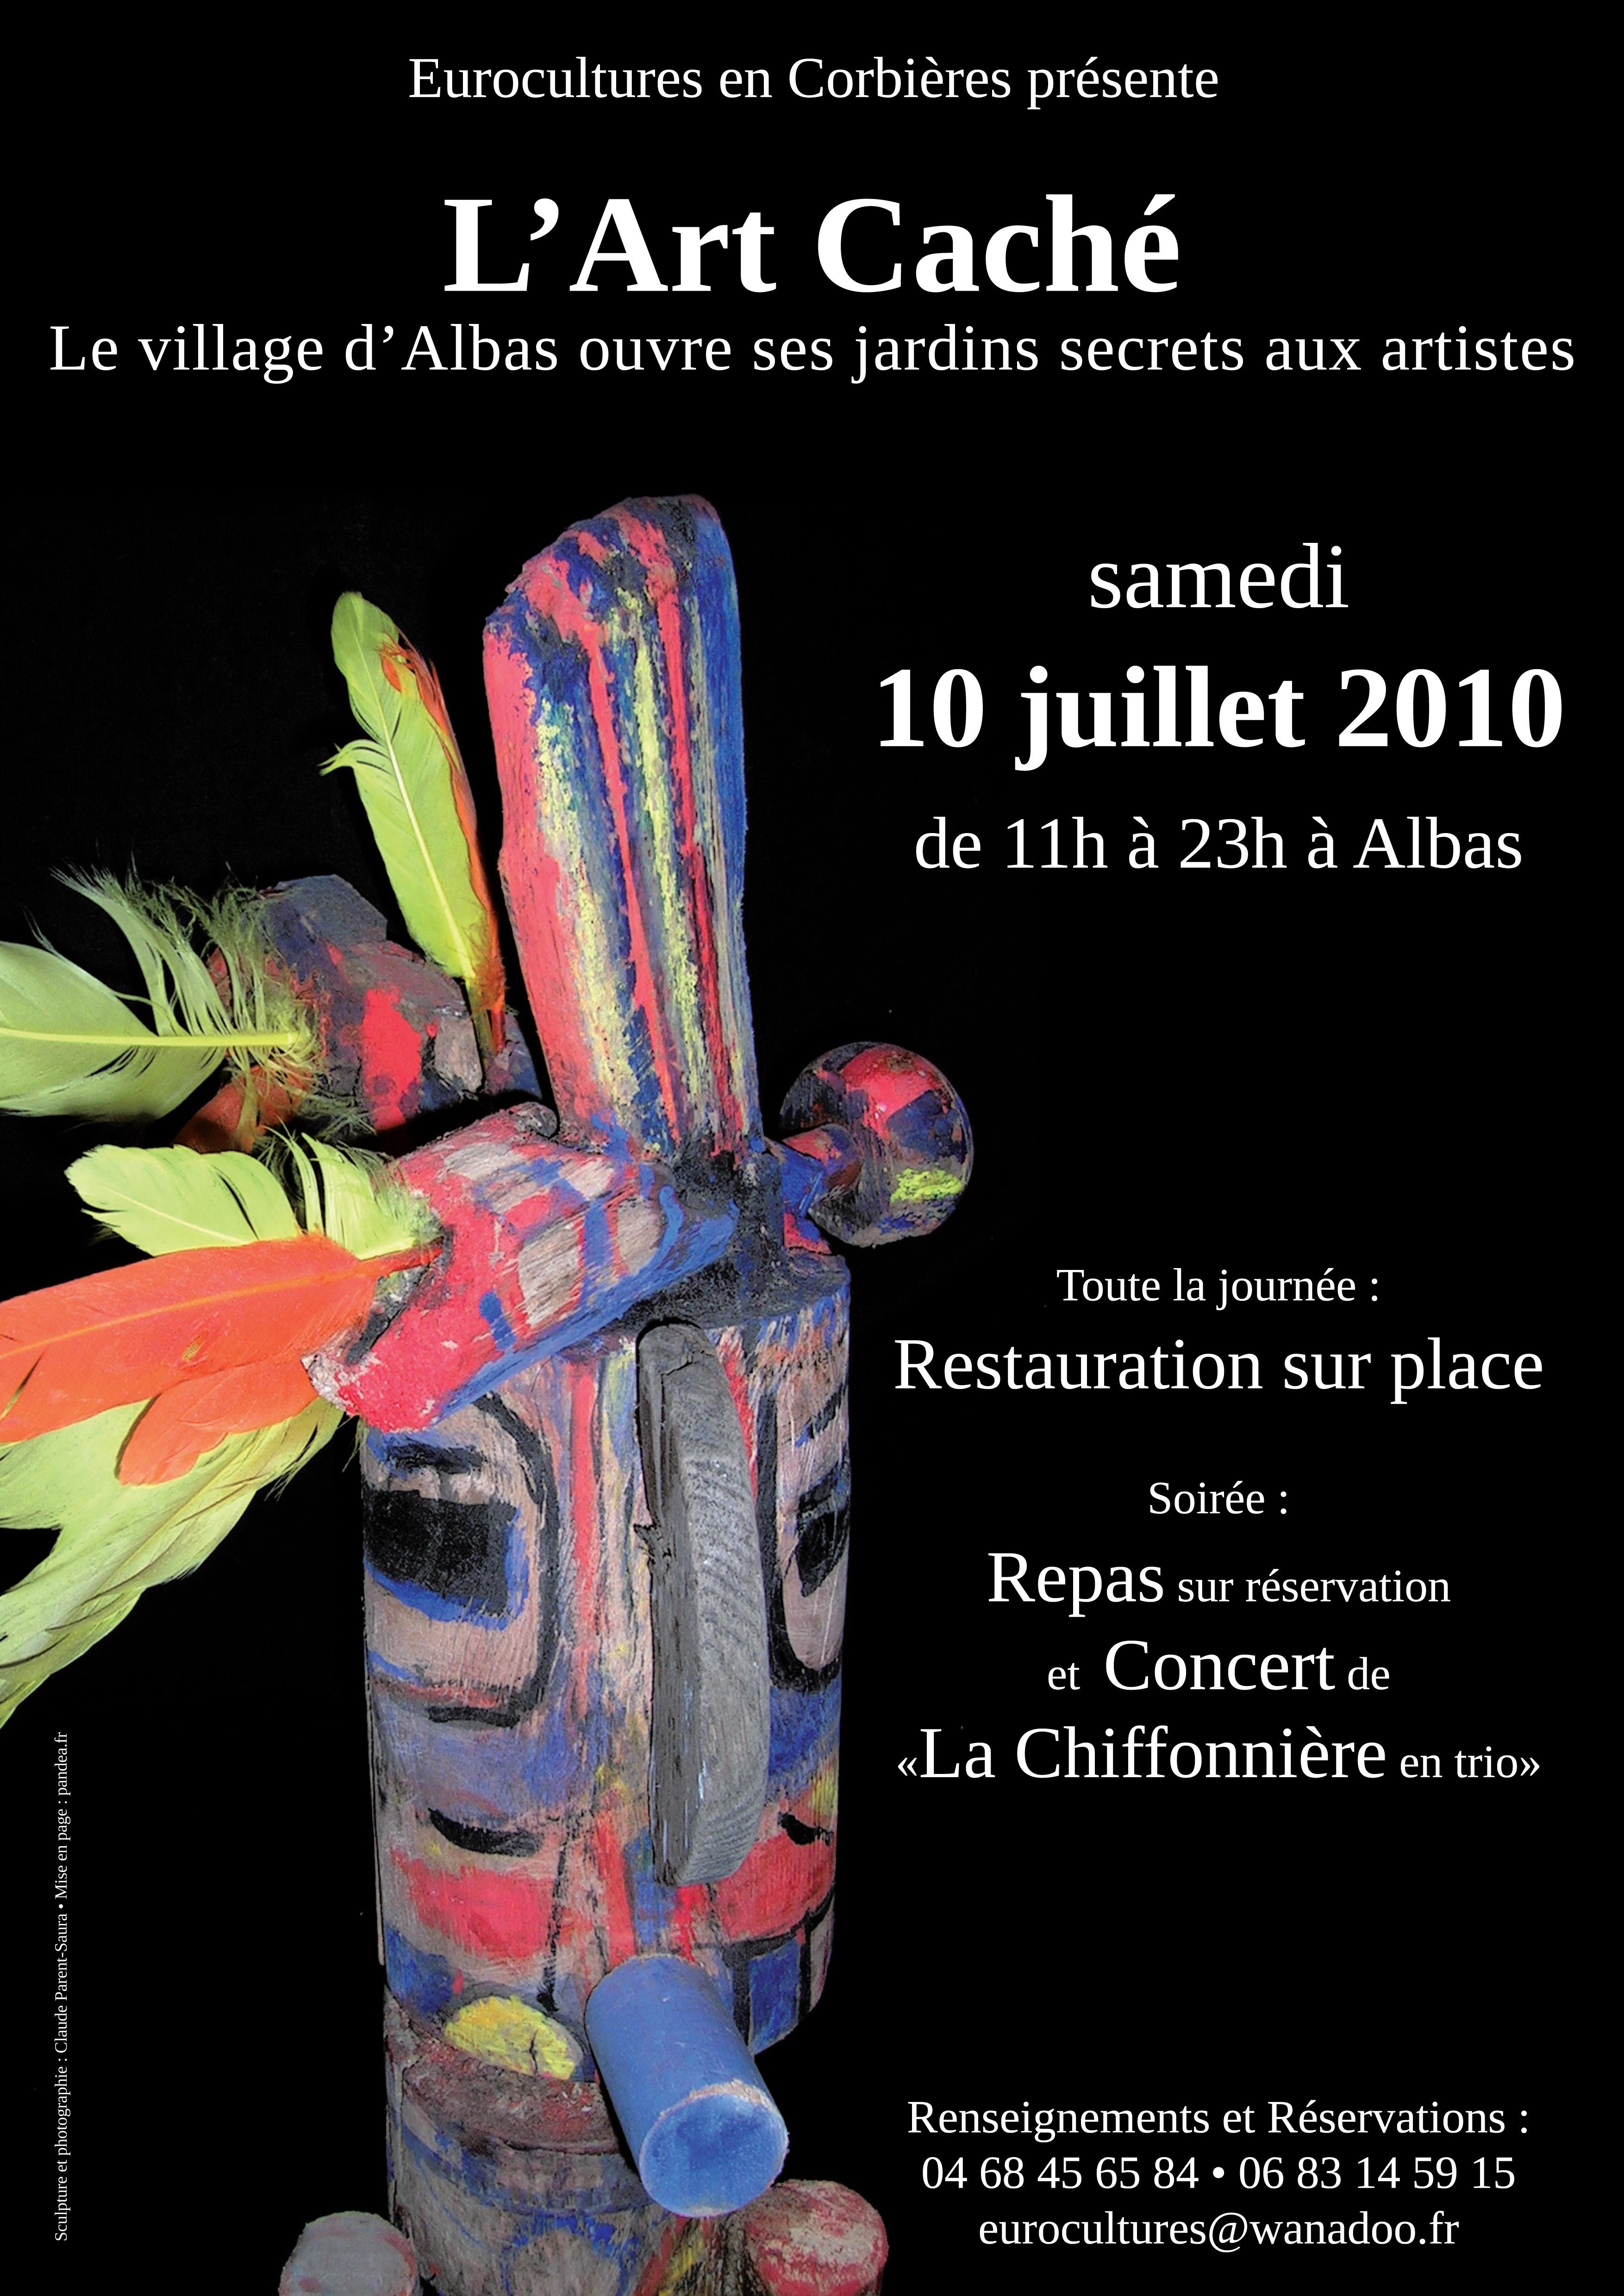 L'Art Caché 2010